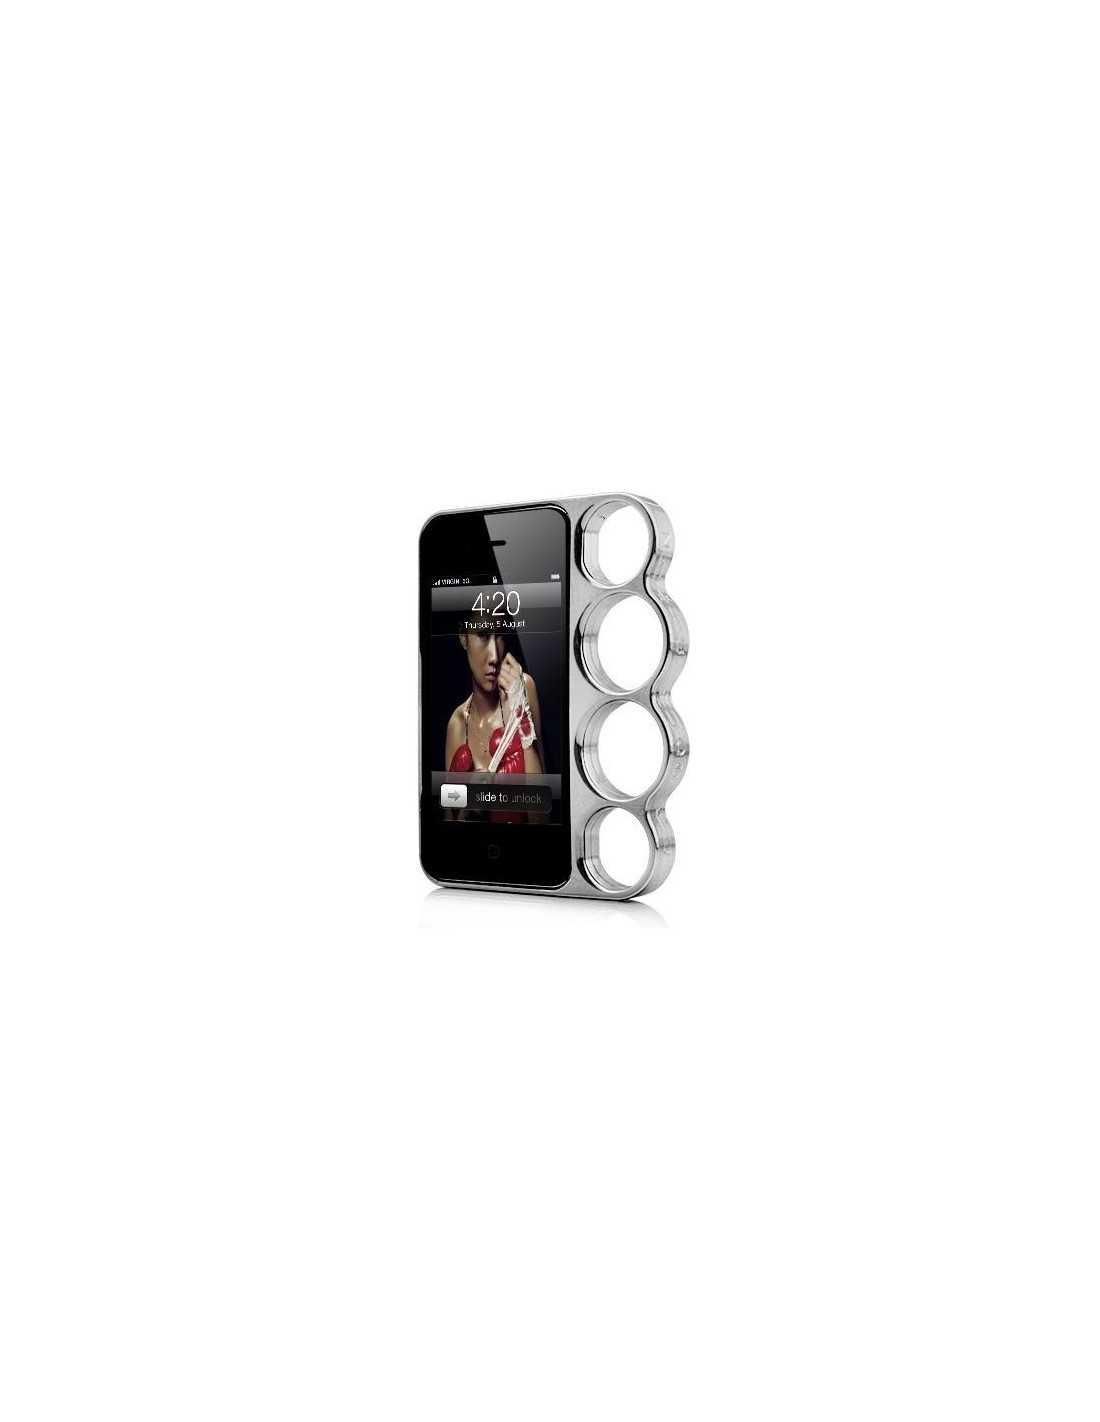 Coque Apple iPhone 5 et 5S Poing Americain